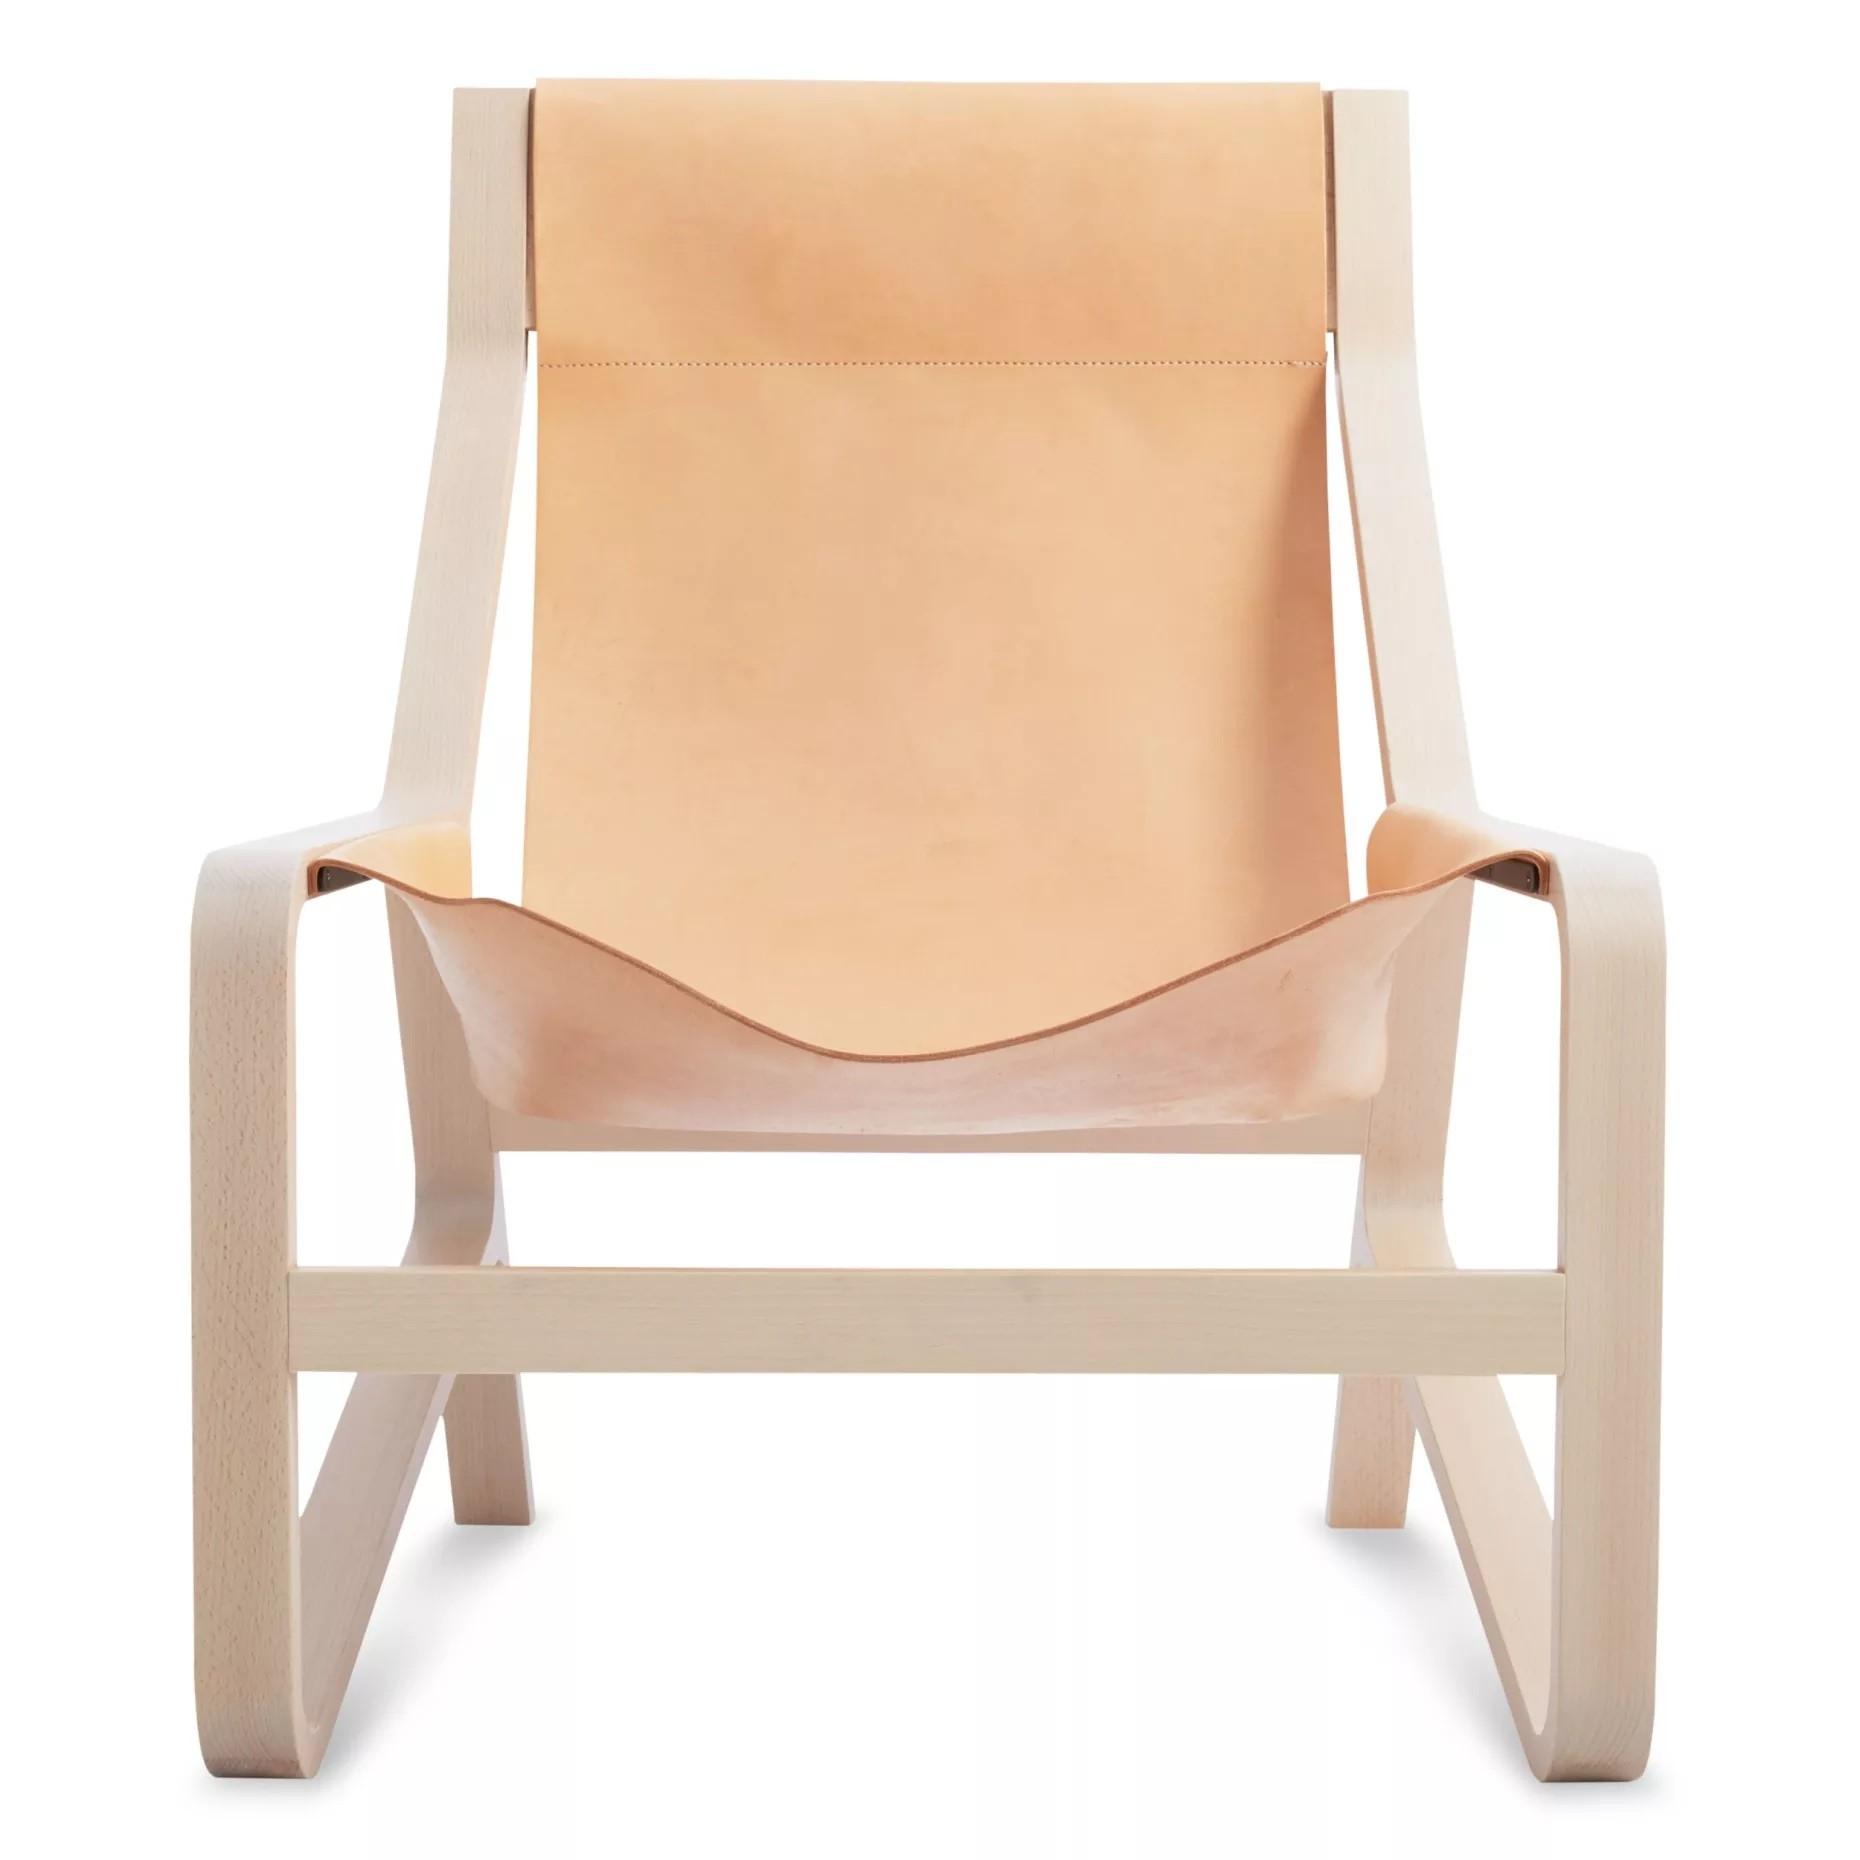 Blu Dot Toro Sling Lounge Chair   AptDeco